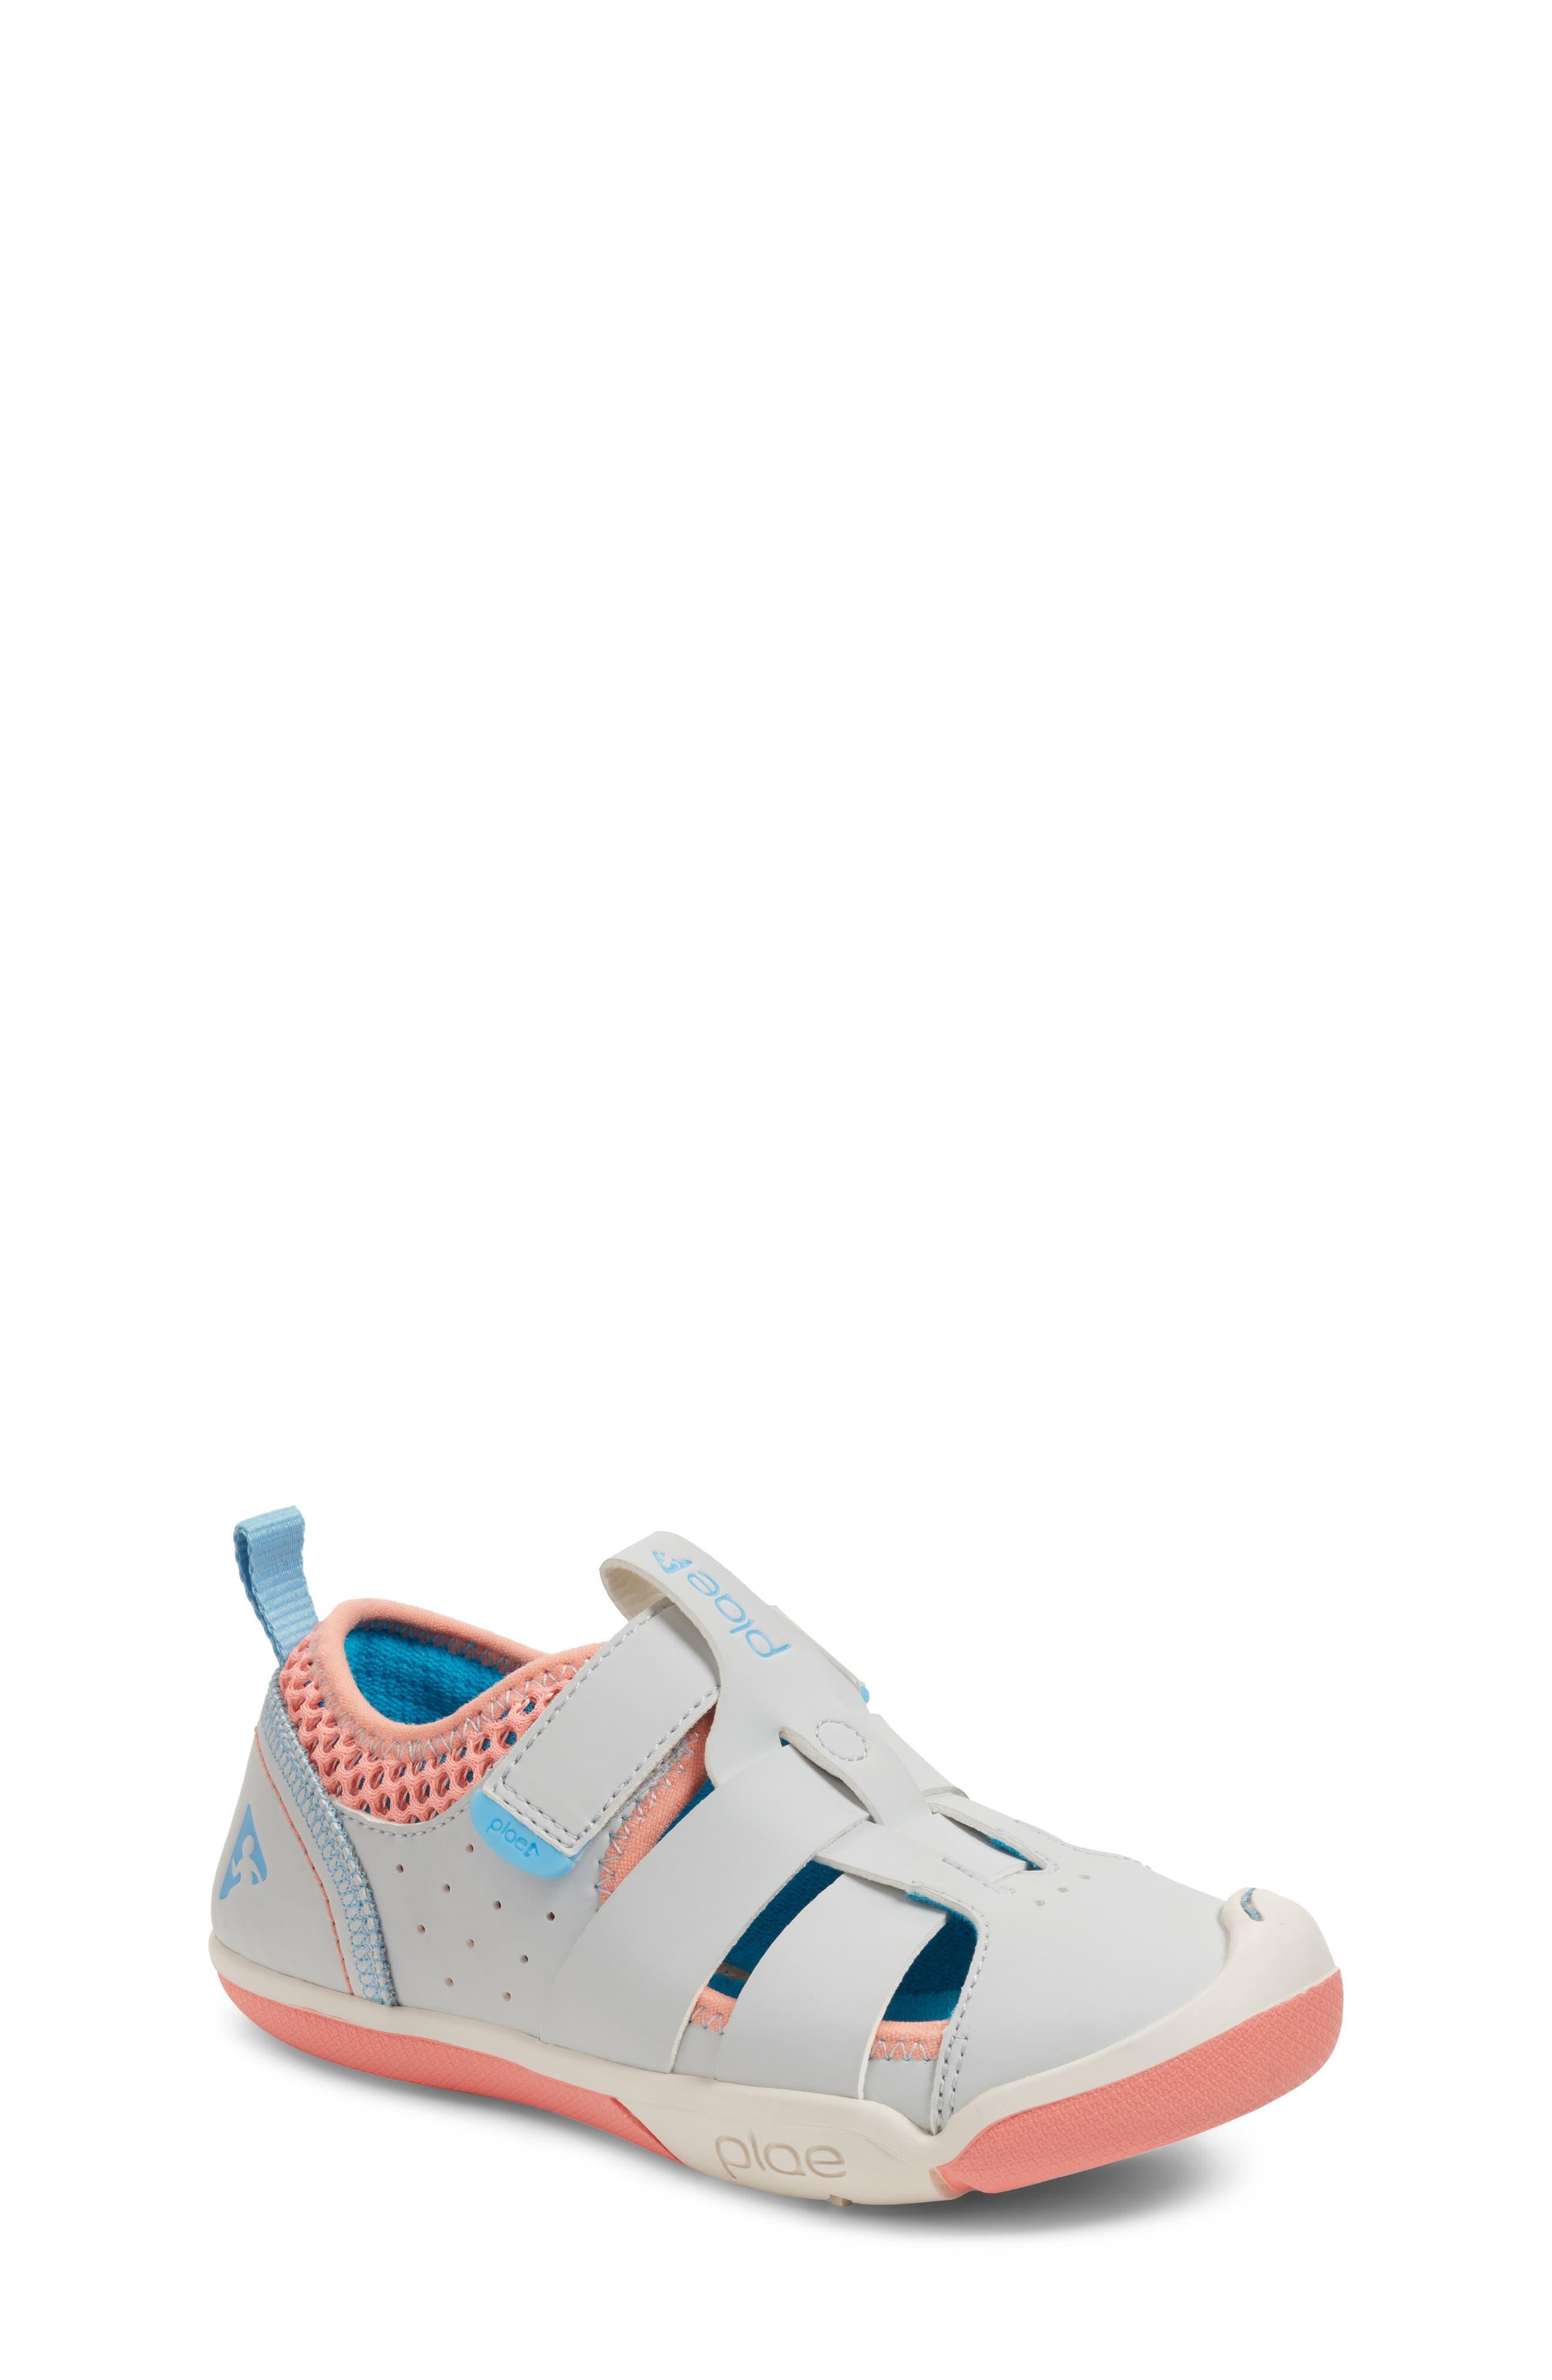 'Sam' Customizable Sneaker,                             Main thumbnail 1, color,                             Opal